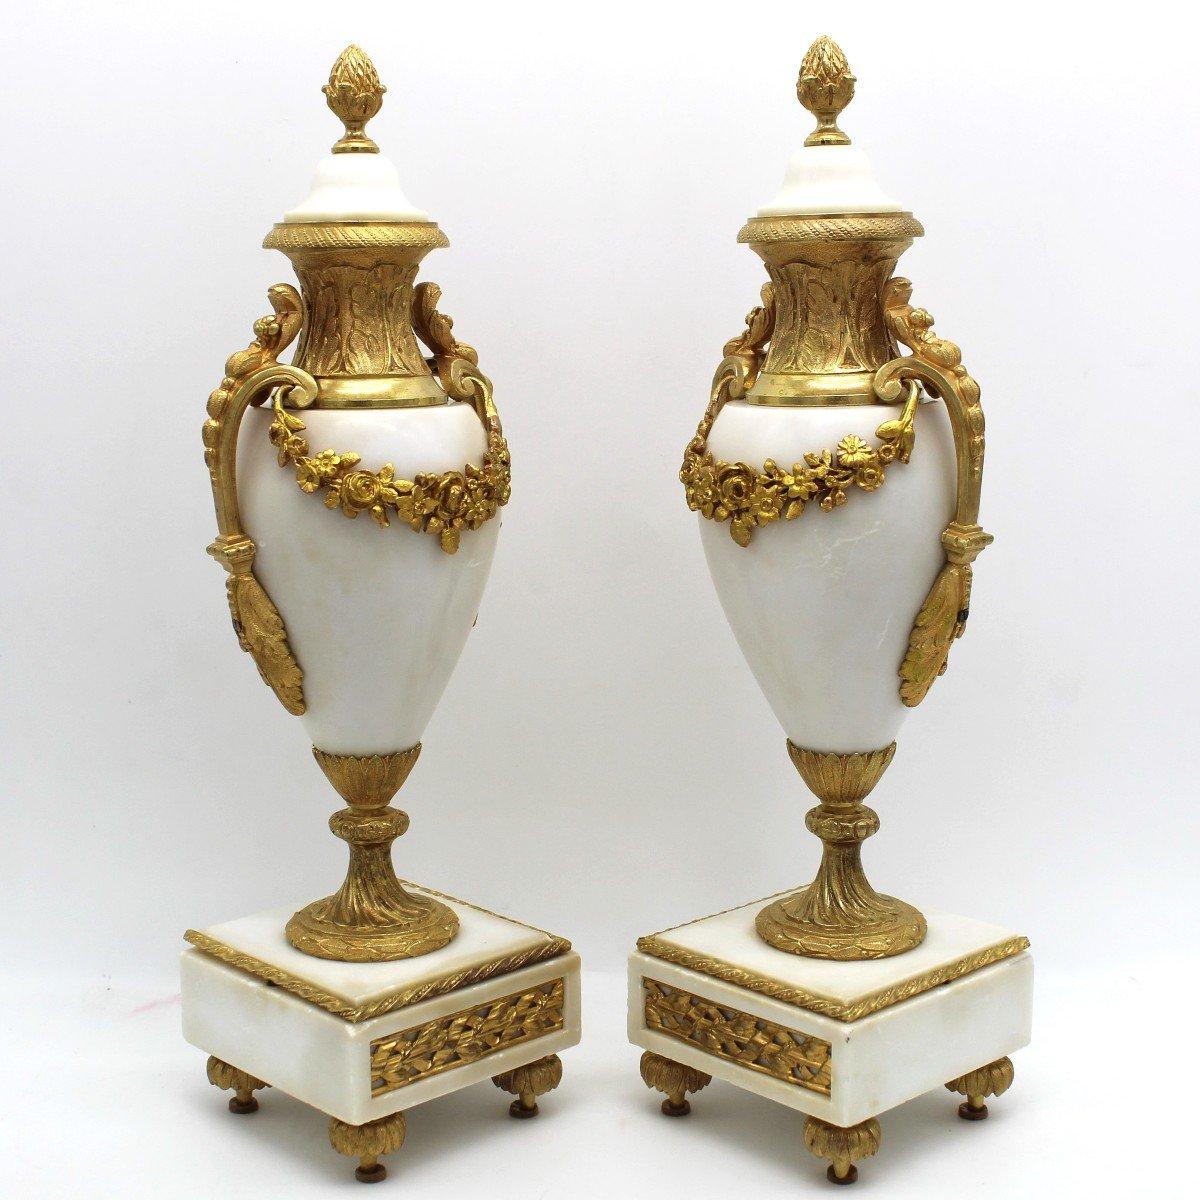 Antique Pair Of Napoleon III Cassolette Vases In Gilt Bronze - 19th-photo-1